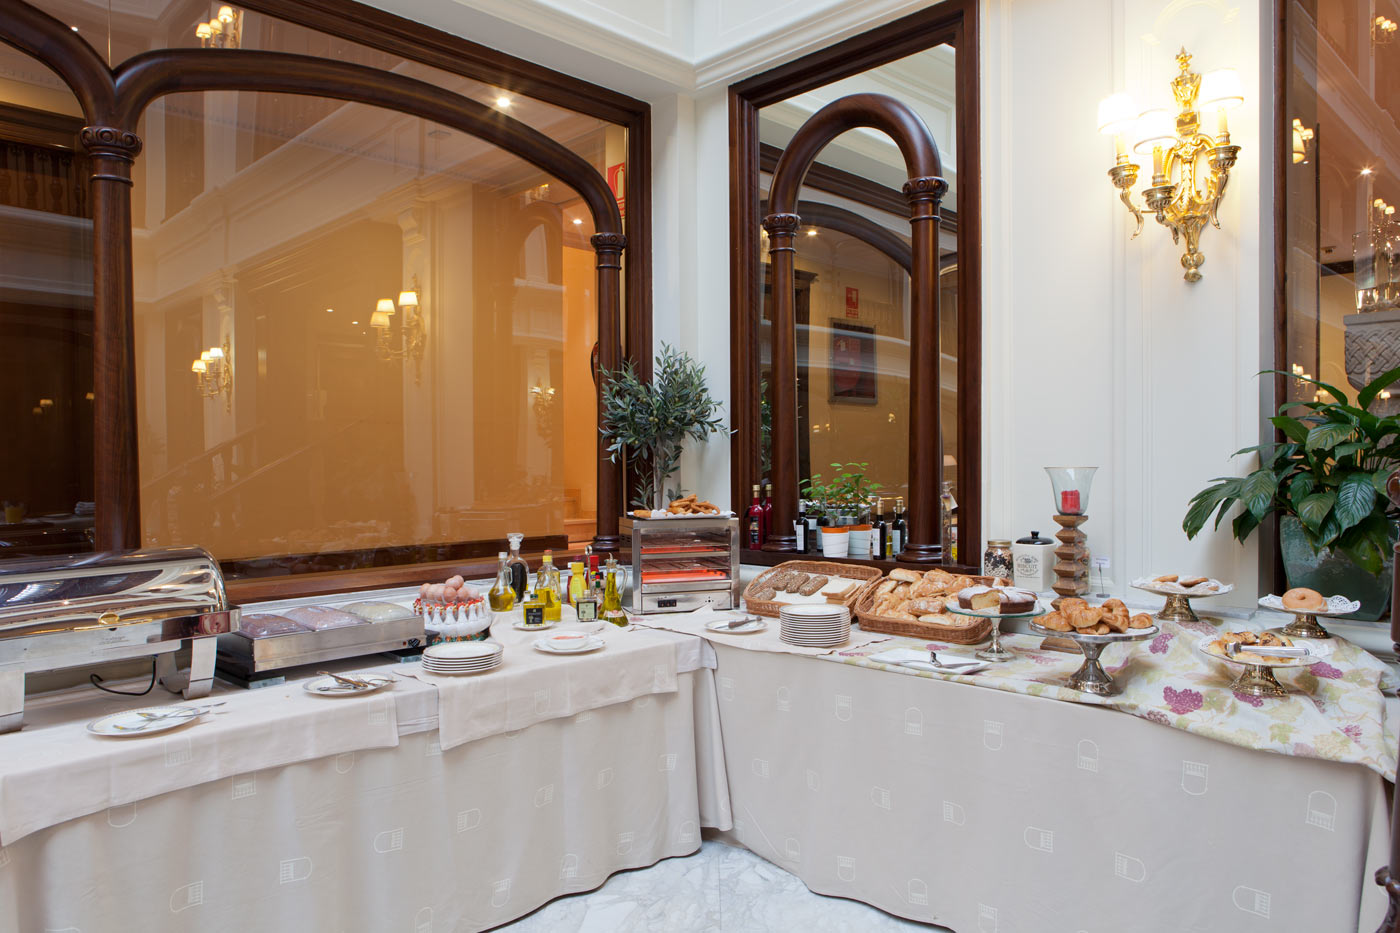 Hotel Don Pio - Breakfast Hall